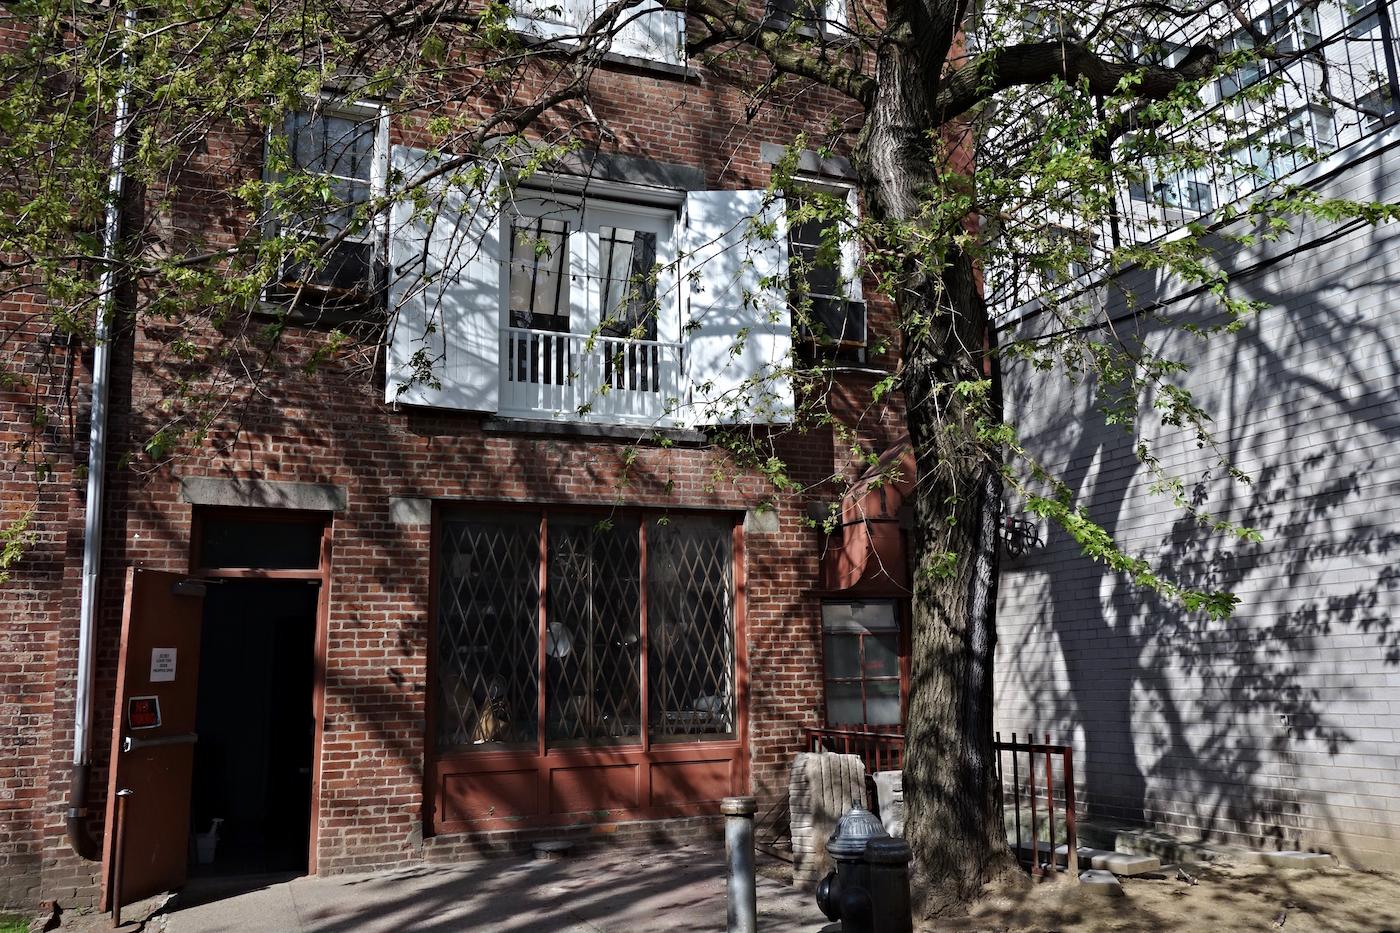 New York Studio School